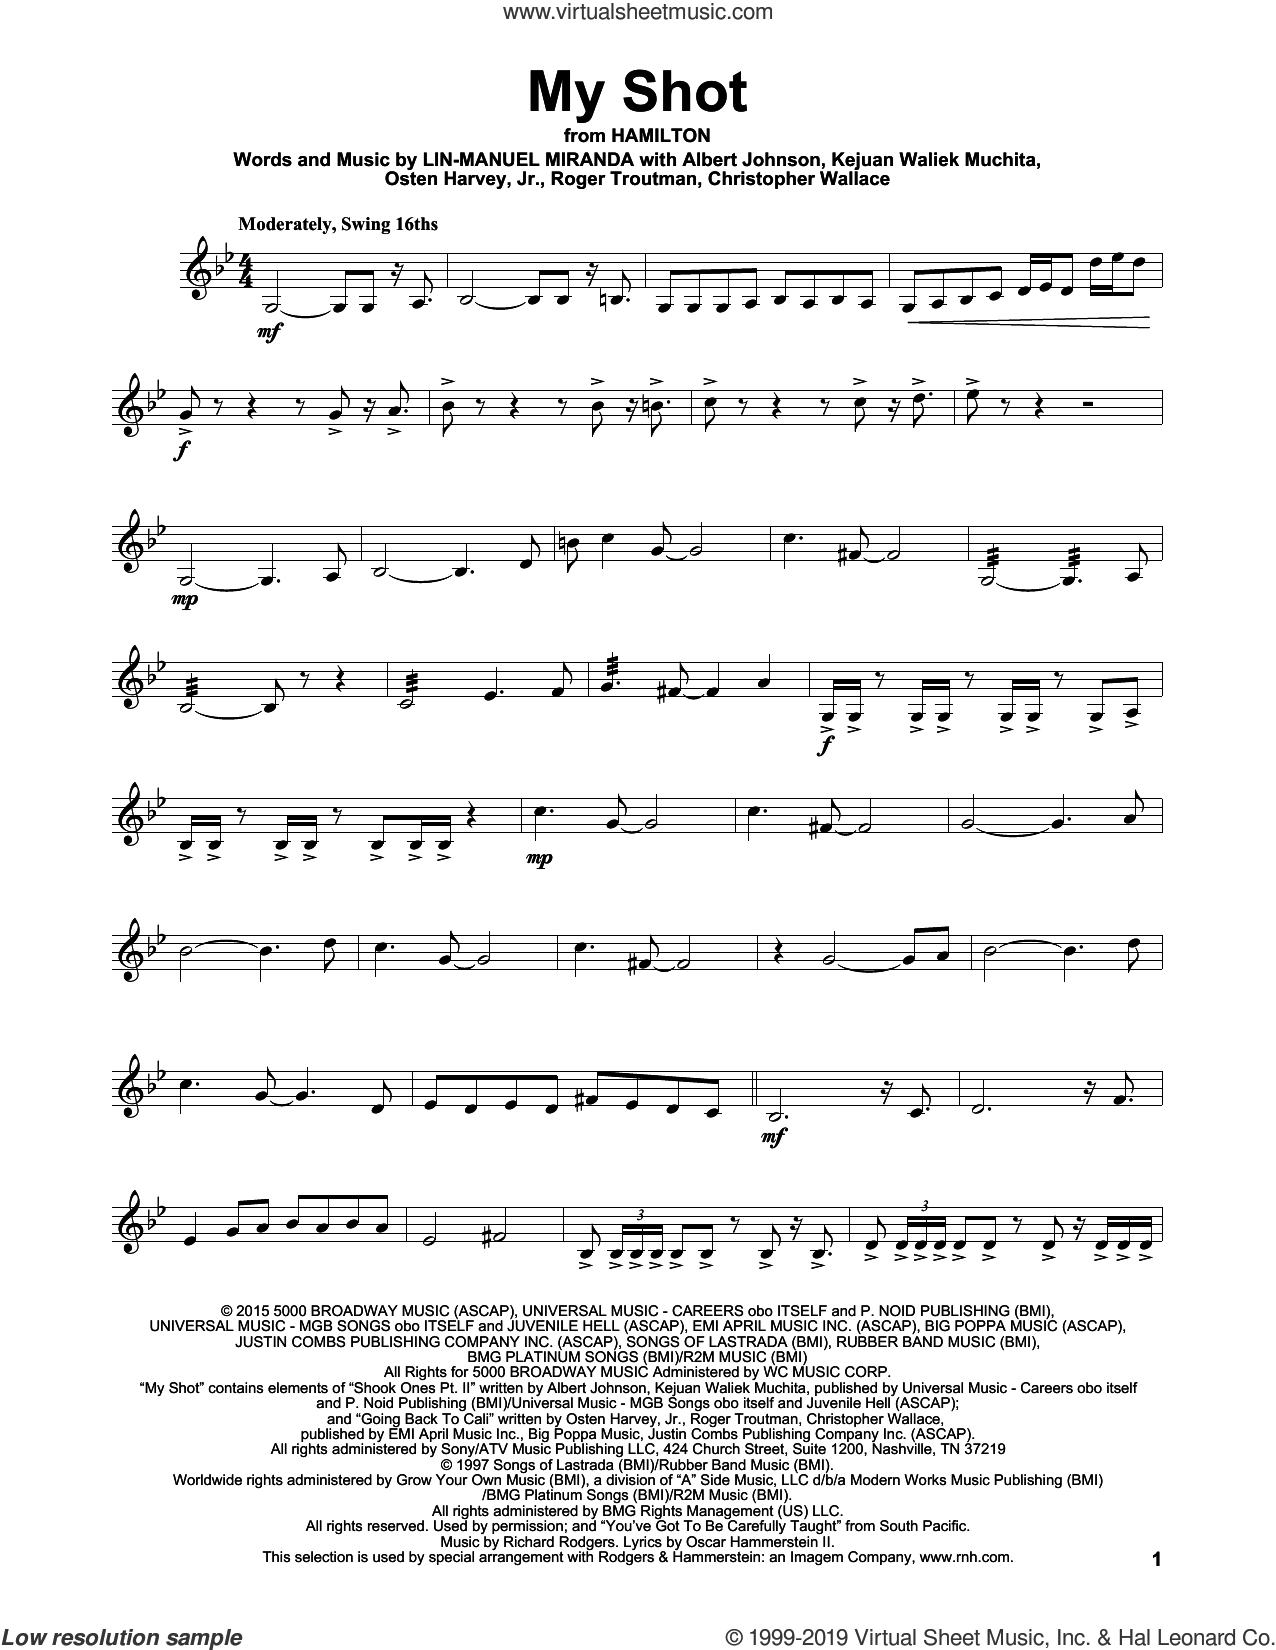 My Shot (from Hamilton) sheet music for violin solo by Lin-Manuel Miranda, Albert Johnson, Christopher Wallace, Kejuan Waliek Muchita, Osten Harvey, Jr. and Roger Troutman, intermediate skill level